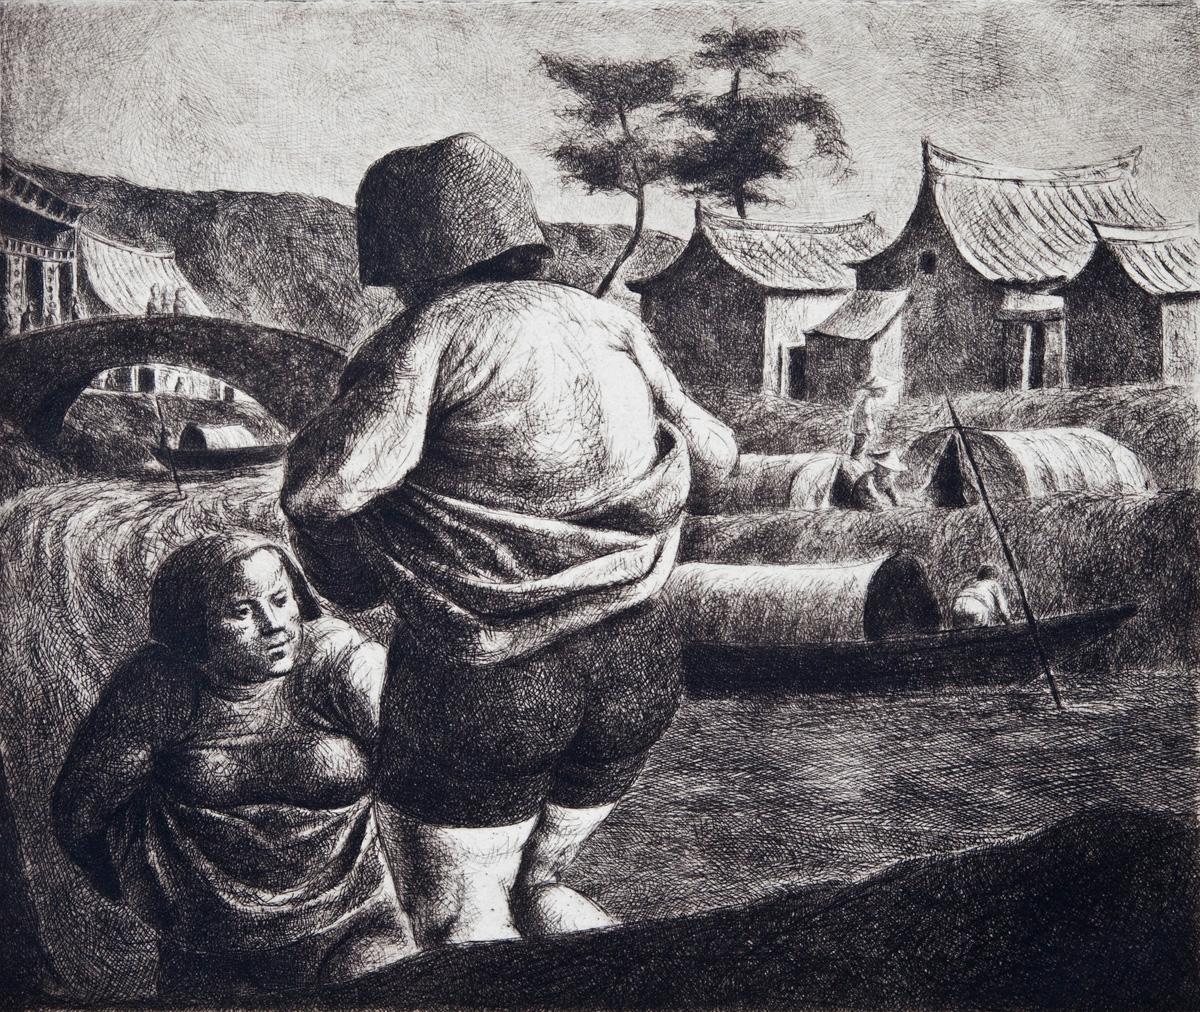 Federico_Castellón_-_Carpeta_China__(1957)_aguafuerte_y_aguatinta